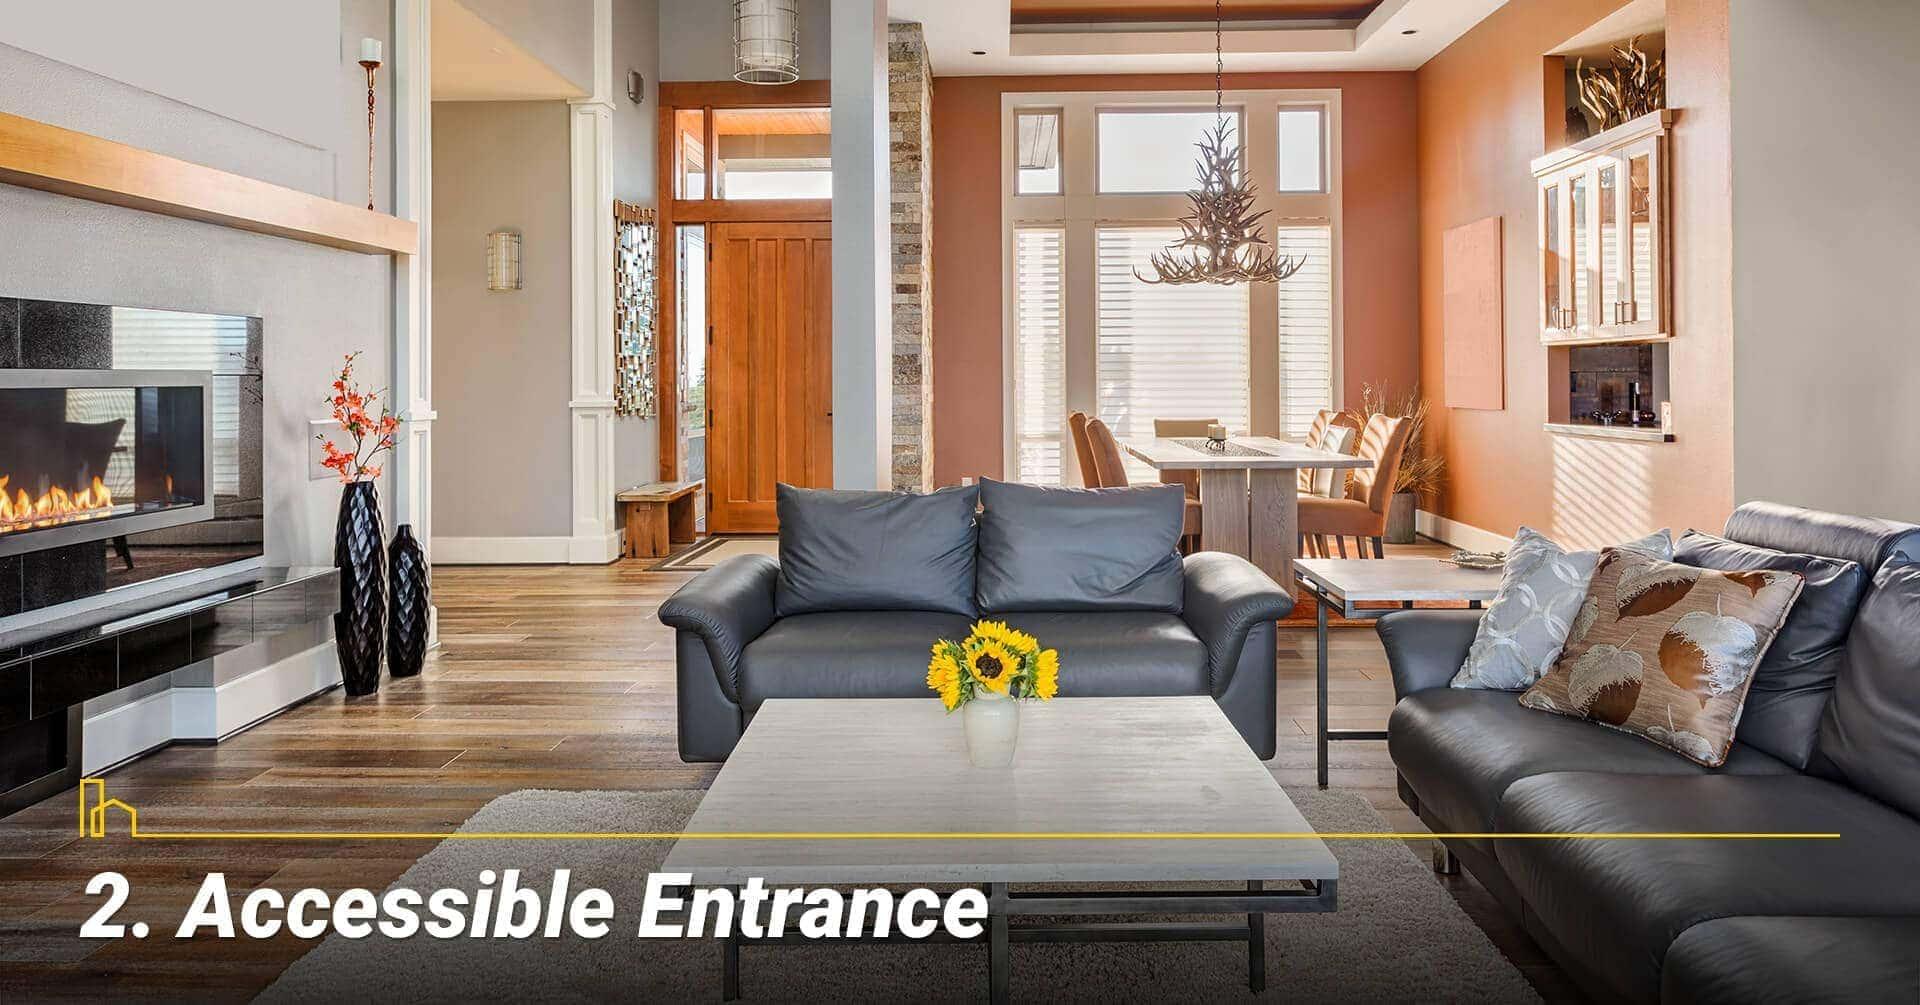 Accessible Entrance